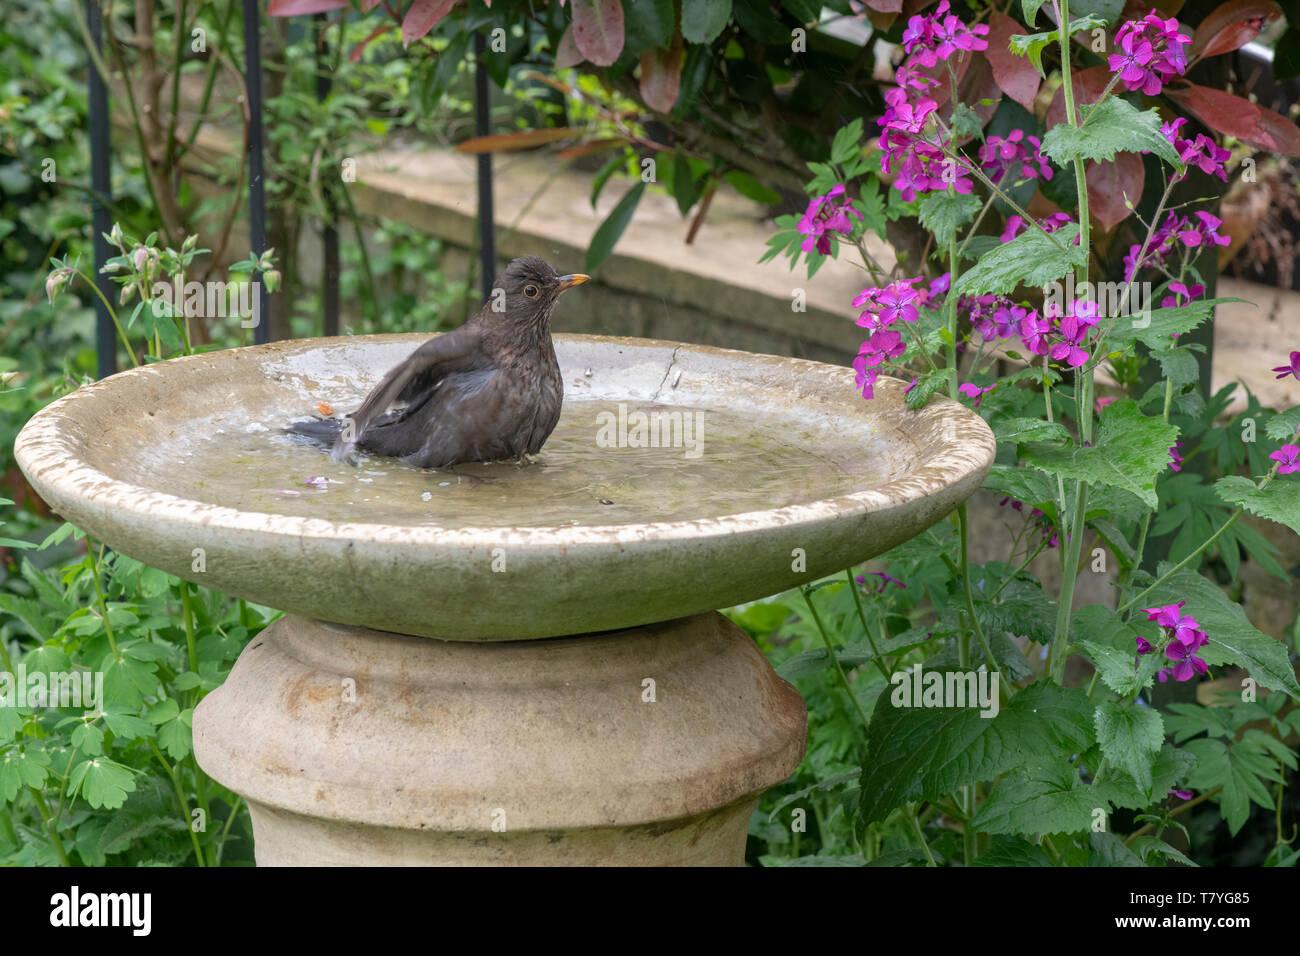 Turdus merula . Female blackbird washing in a bird bath in an english garden. UK - Stock Image